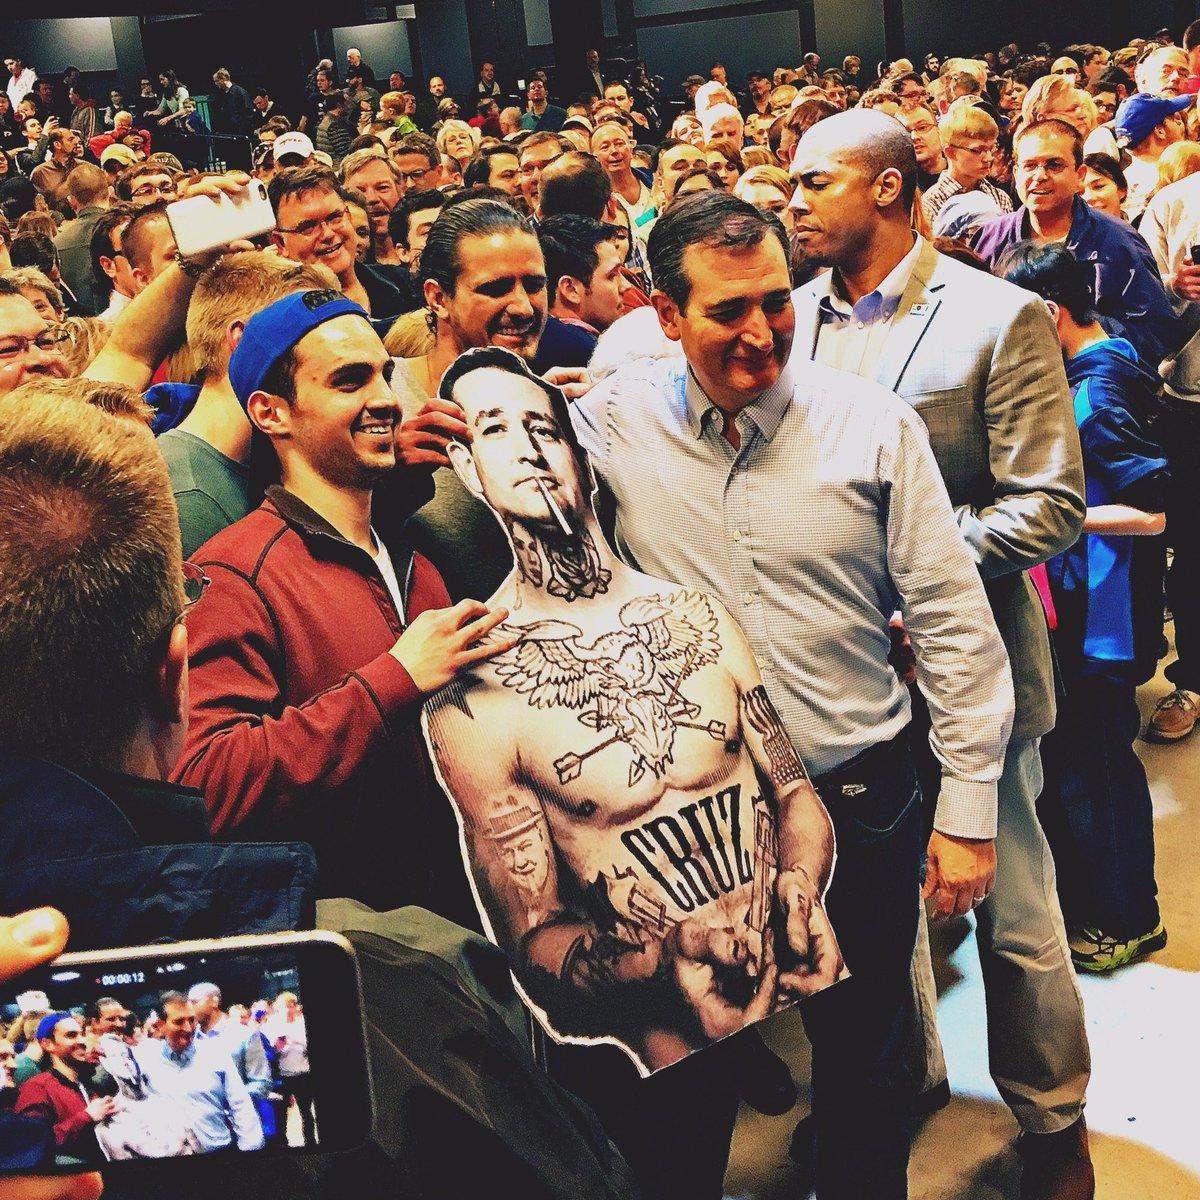 They finally meet. #CruzCrew https://t.co/5WQ7roY3NP